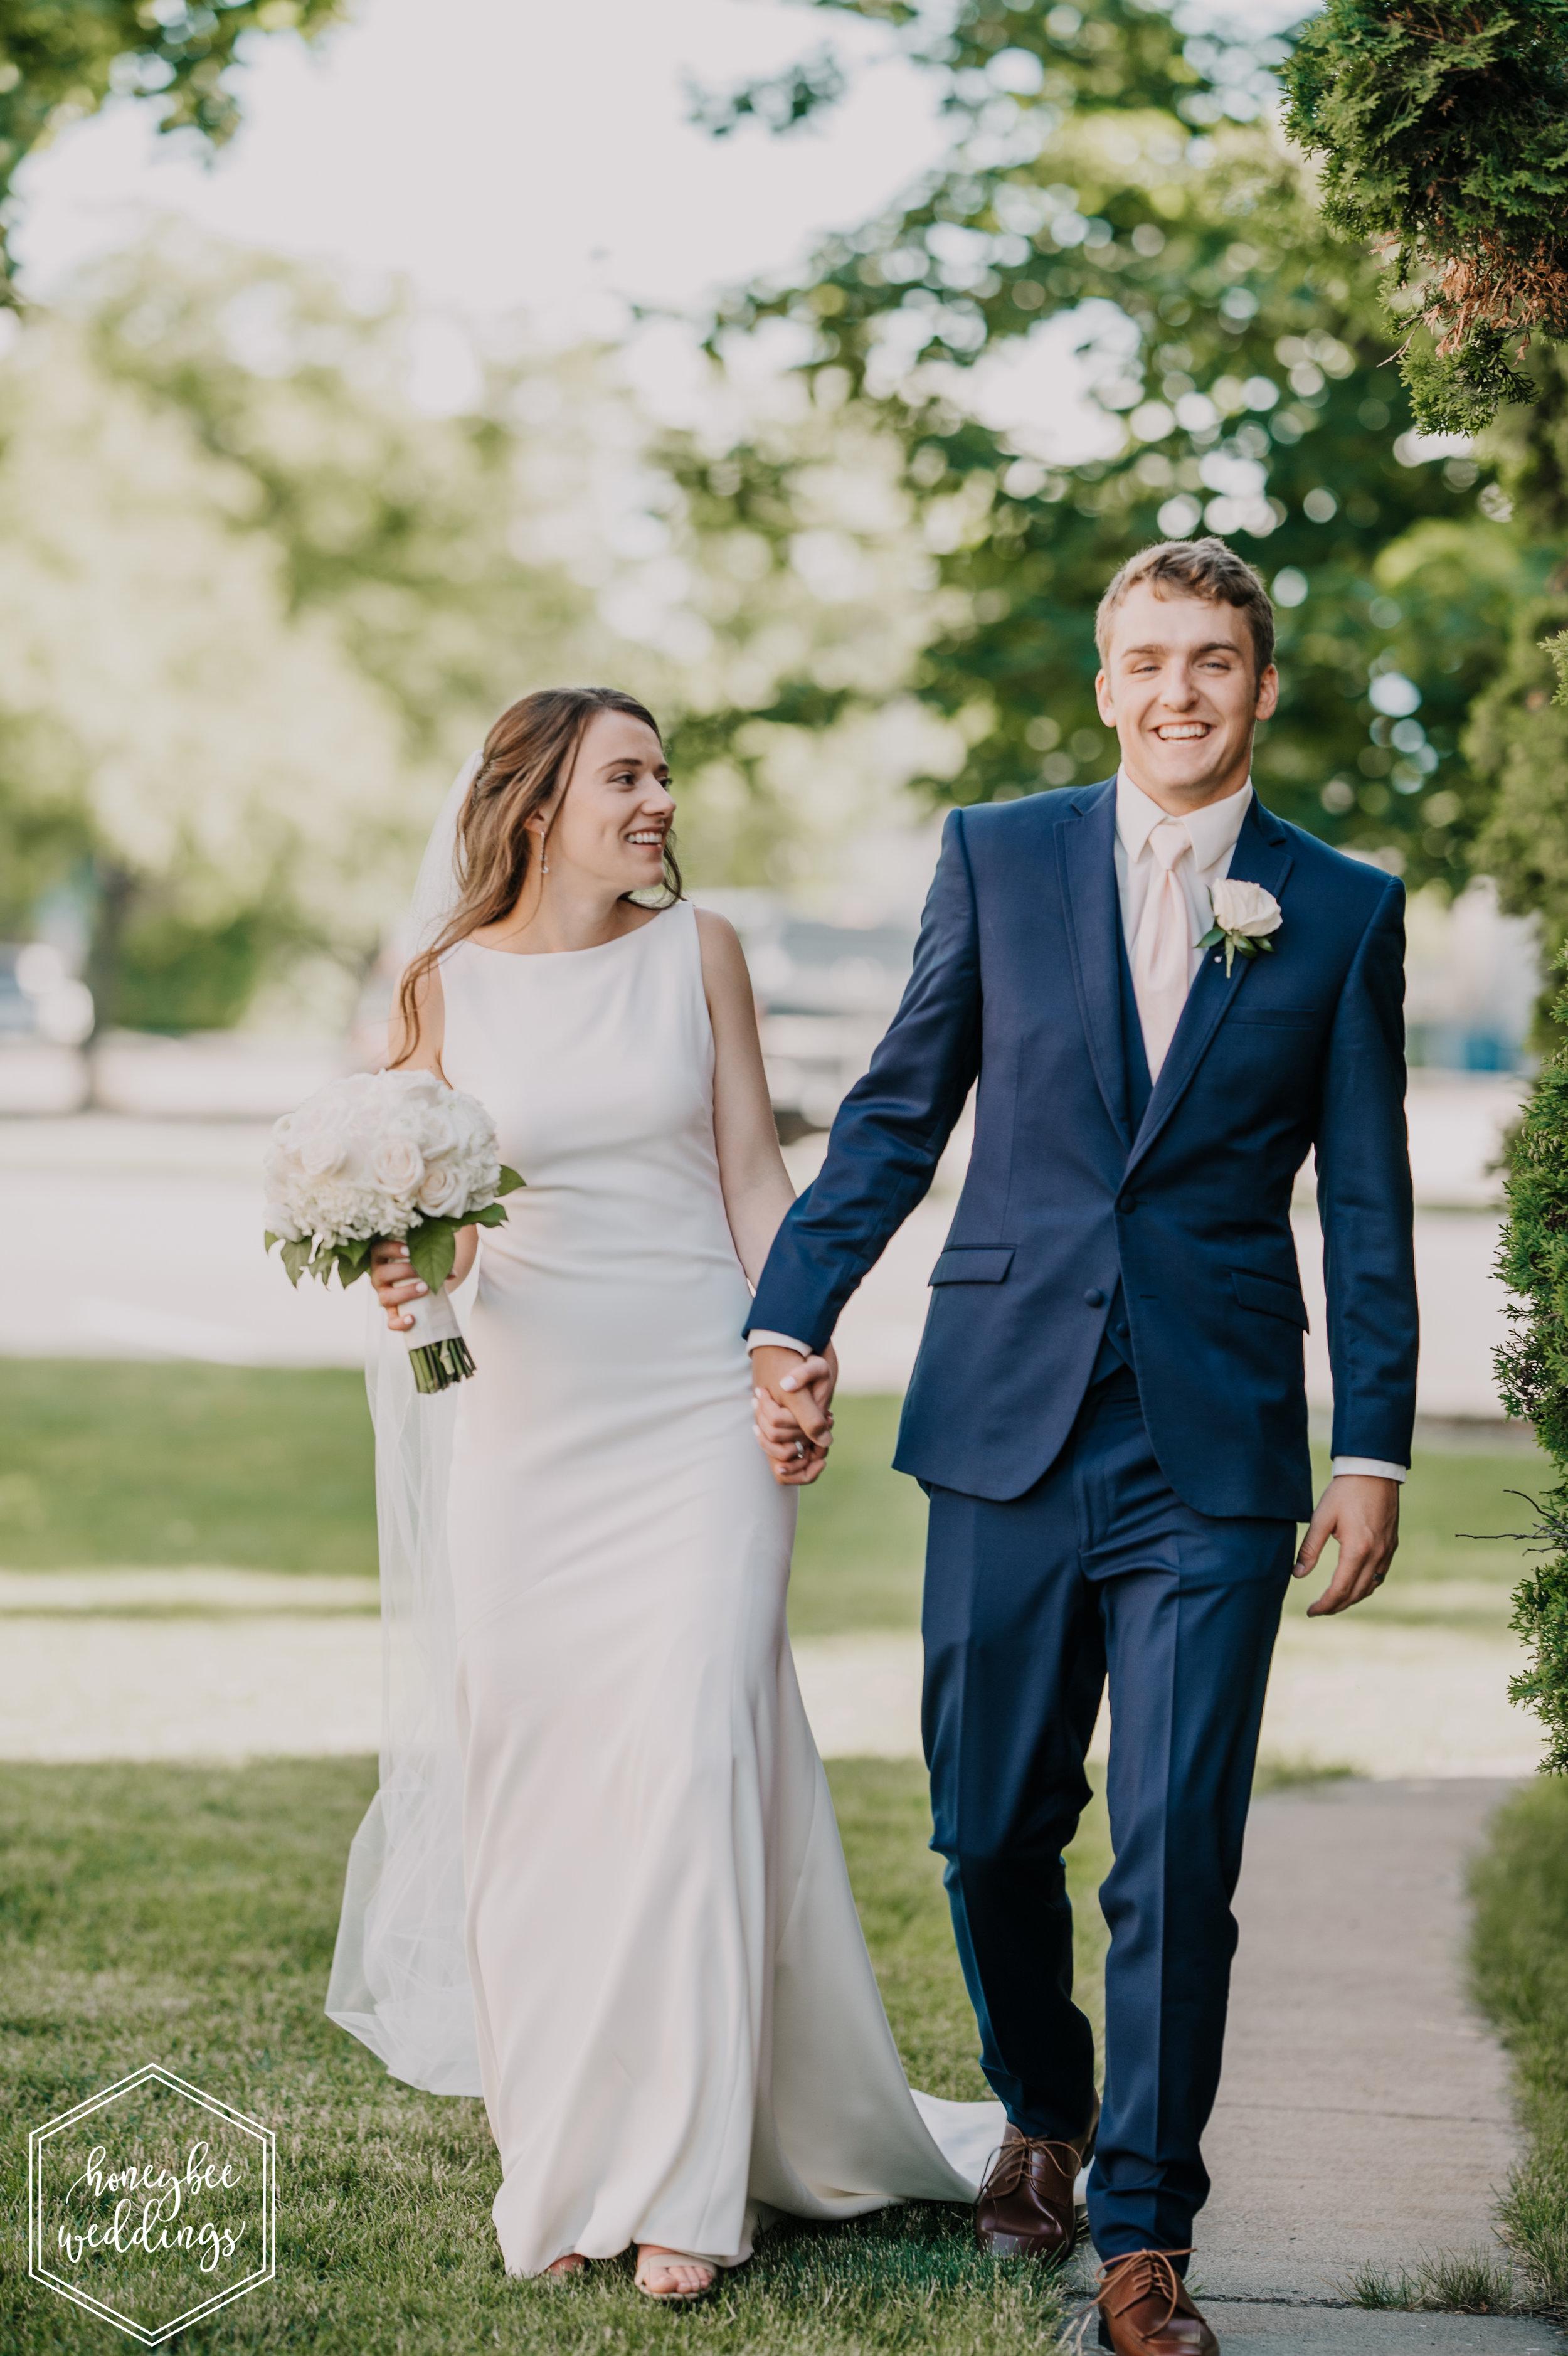 187 Montana Wedding Photographer_St. Francis Wedding_Tifani Zanto + Ryan Burke -5938-2.jpg